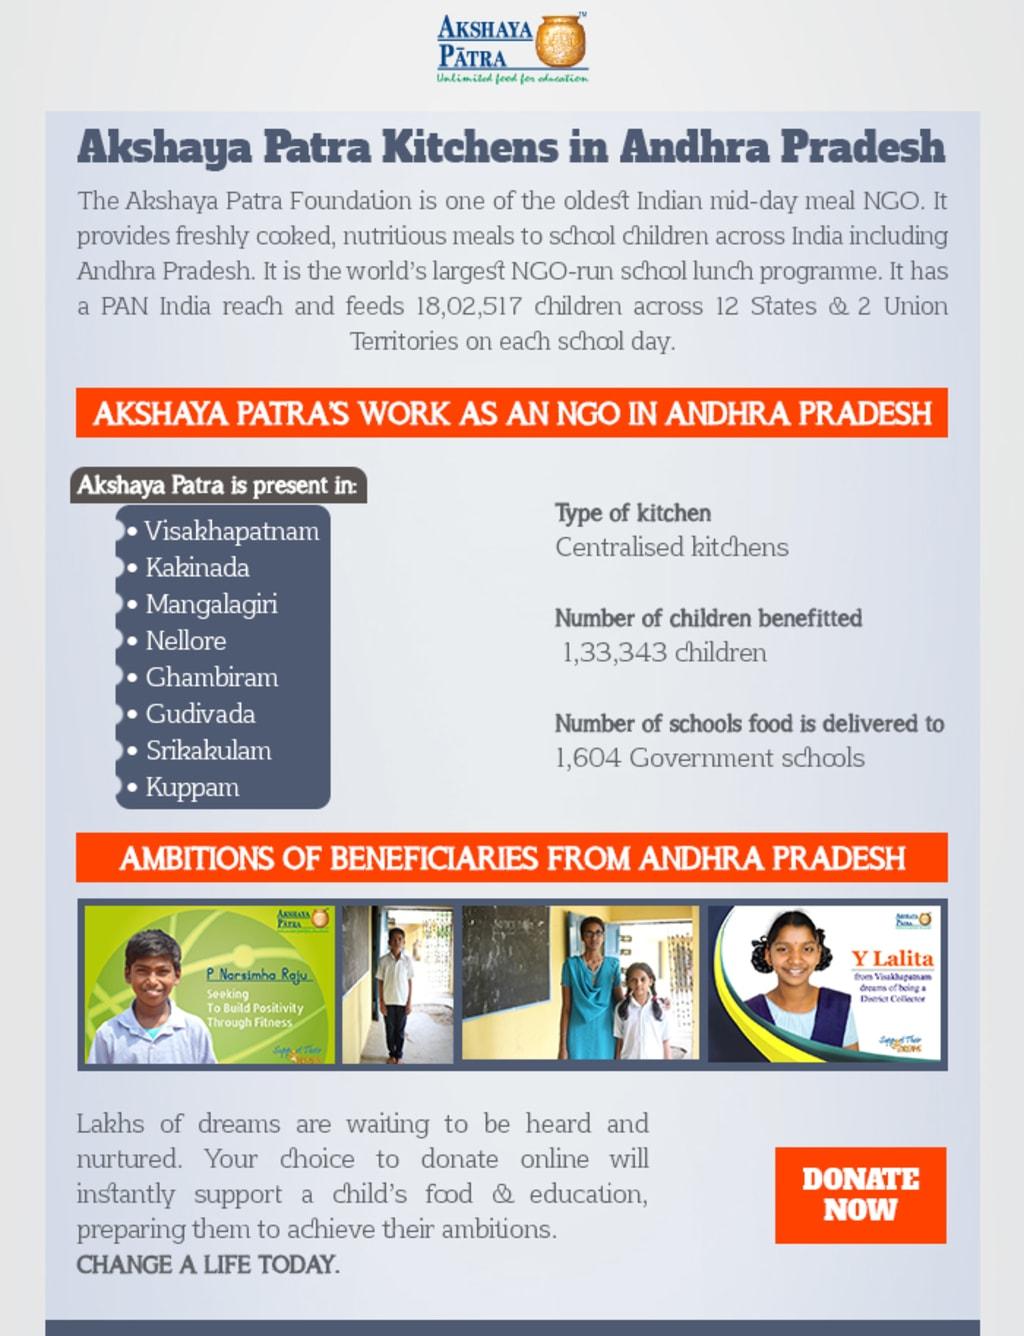 Akshaya Patra Kitchens in Andhra Pradesh via Akshaya Patra